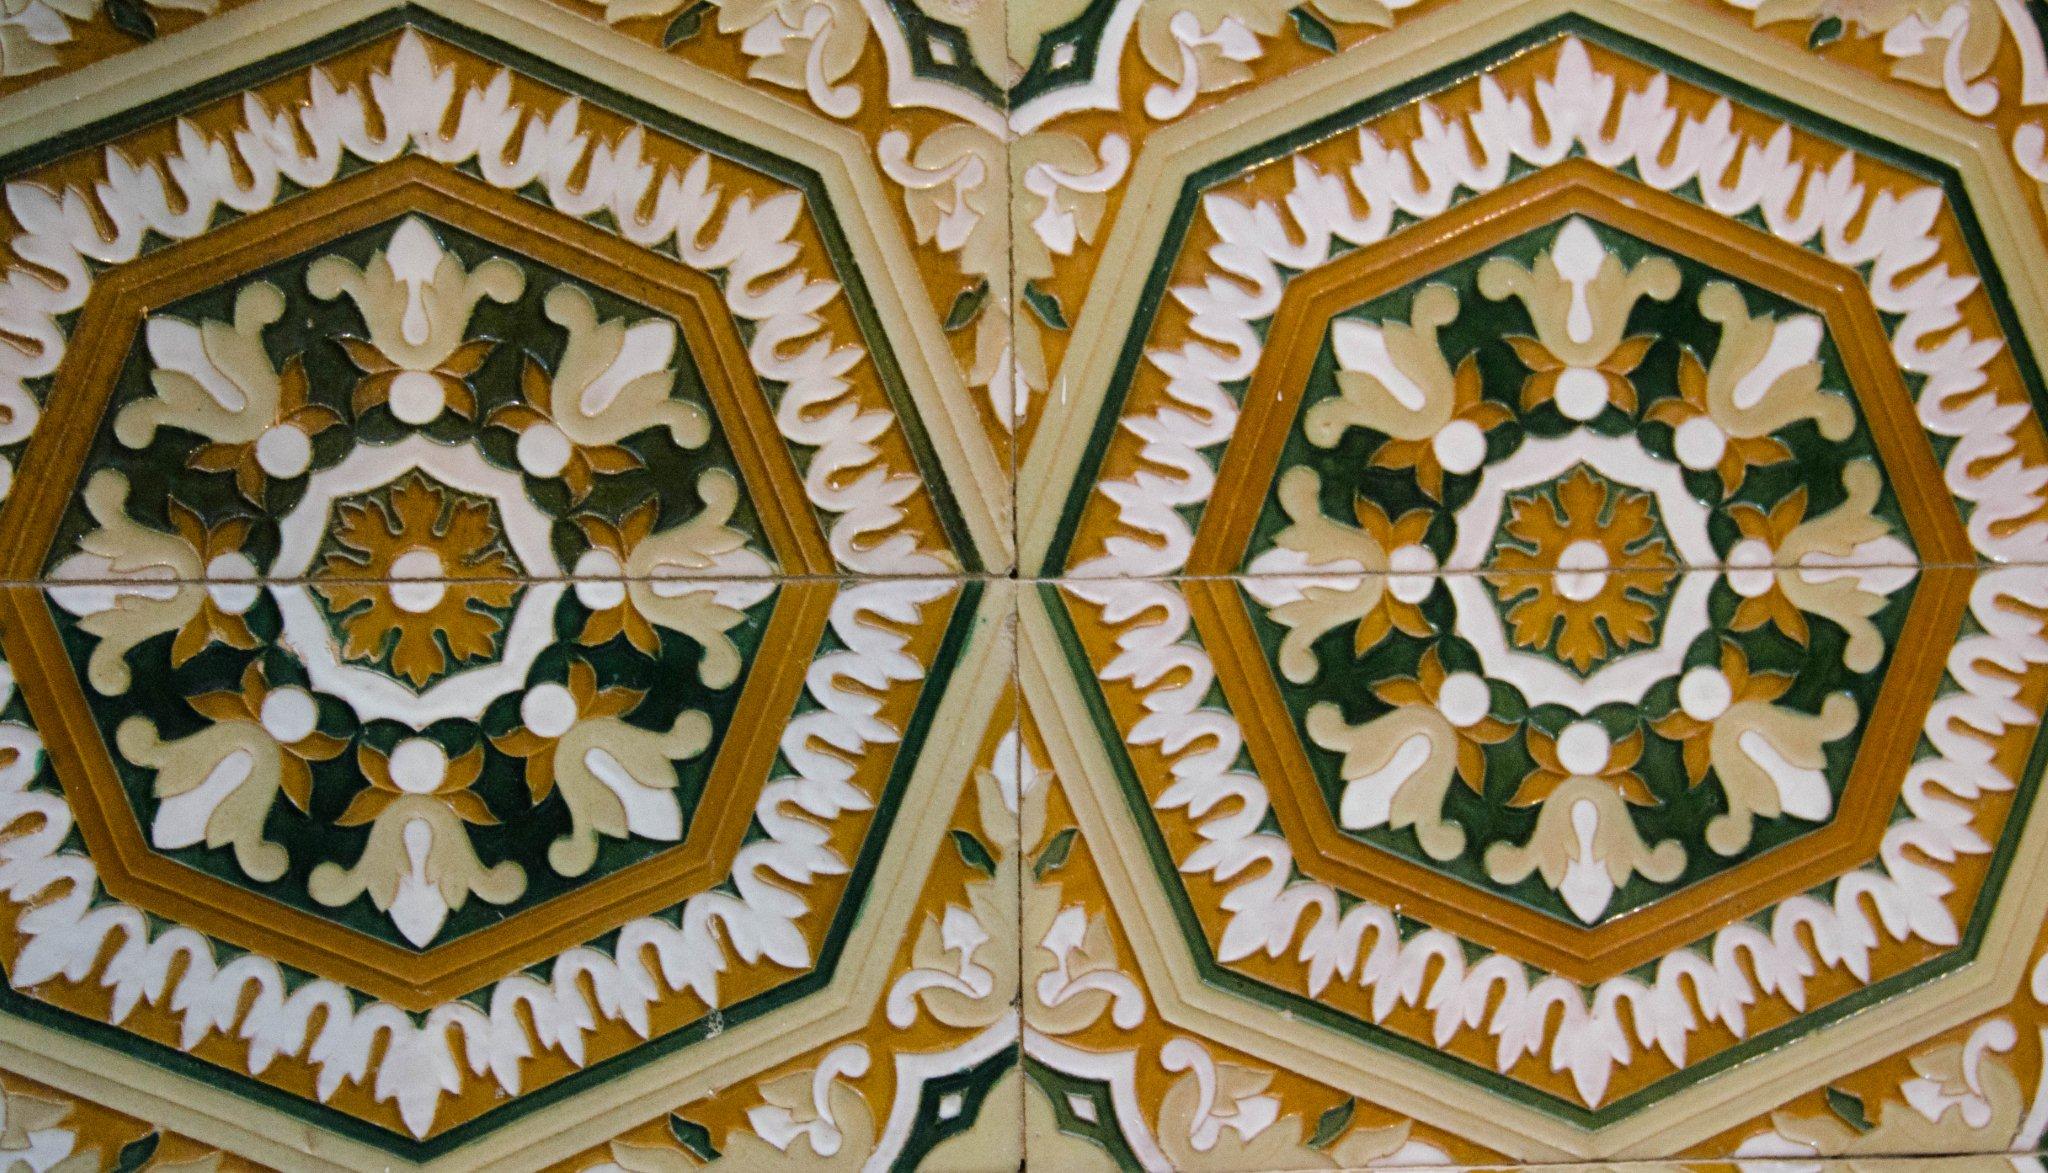 file azulejos c rdoba espa a wikimedia commons